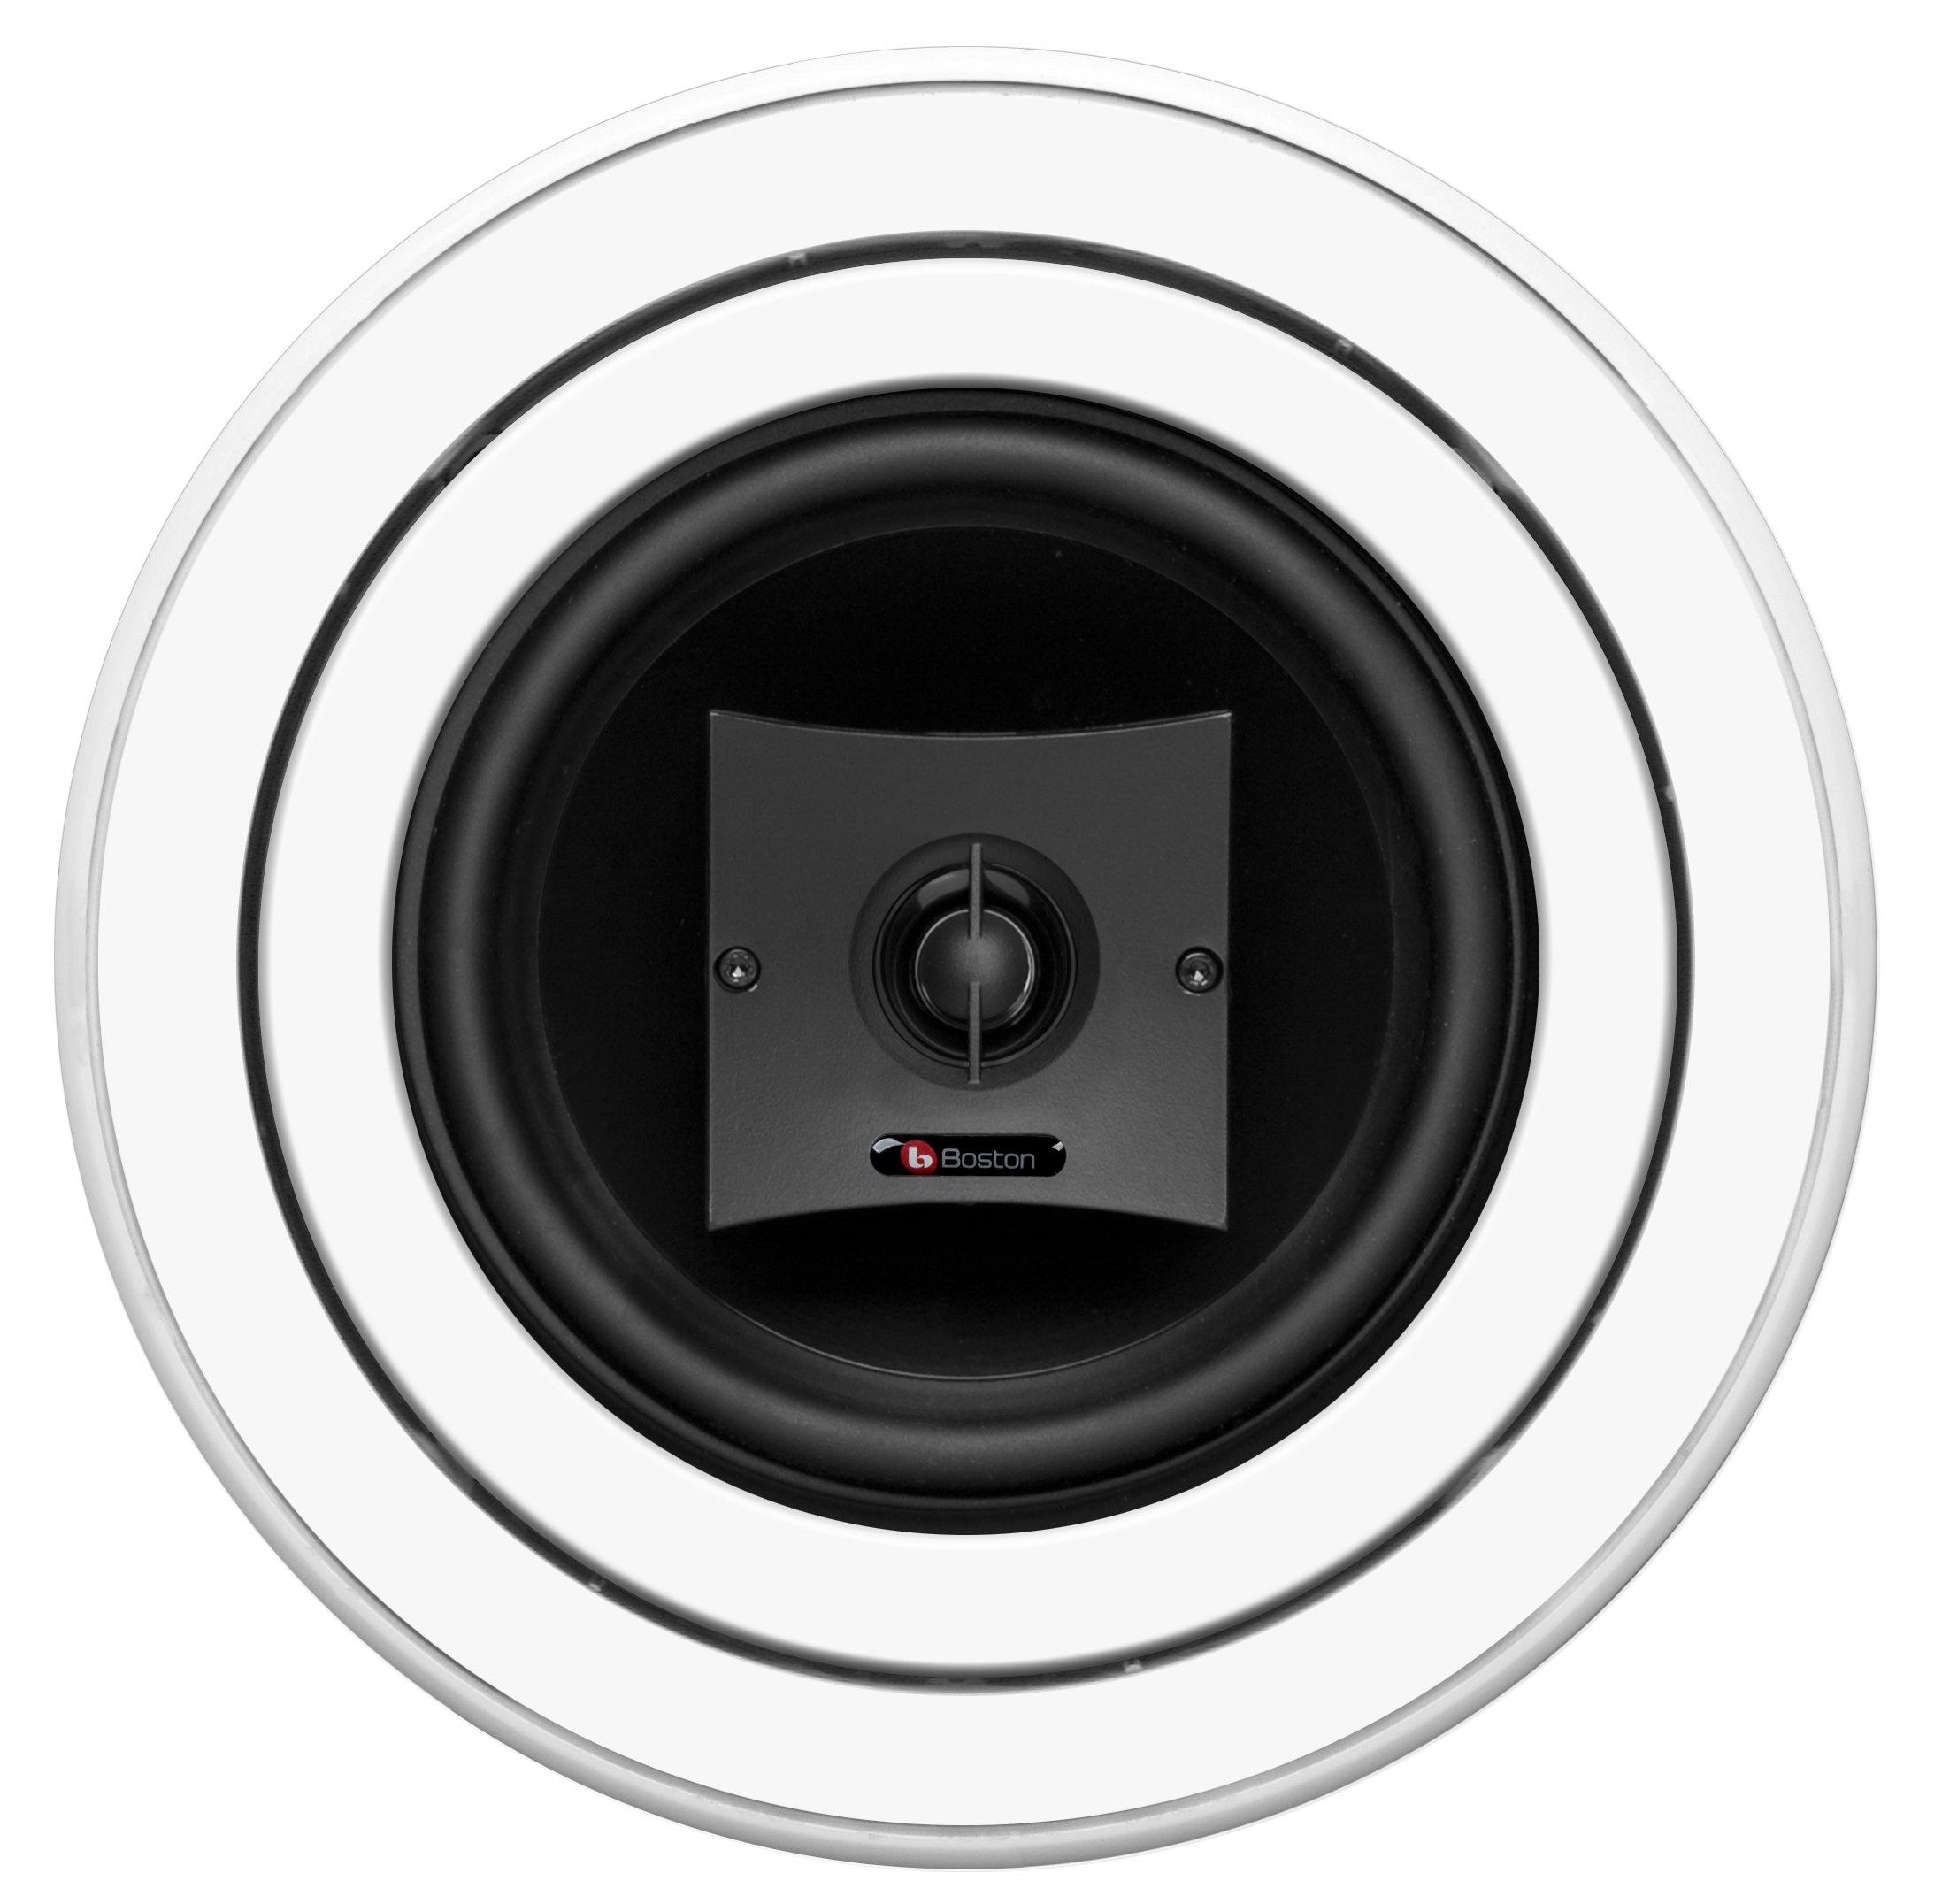 Boston Acoustics HSi 460 In-Ceiling Speaker (White) by Boston Acoustics